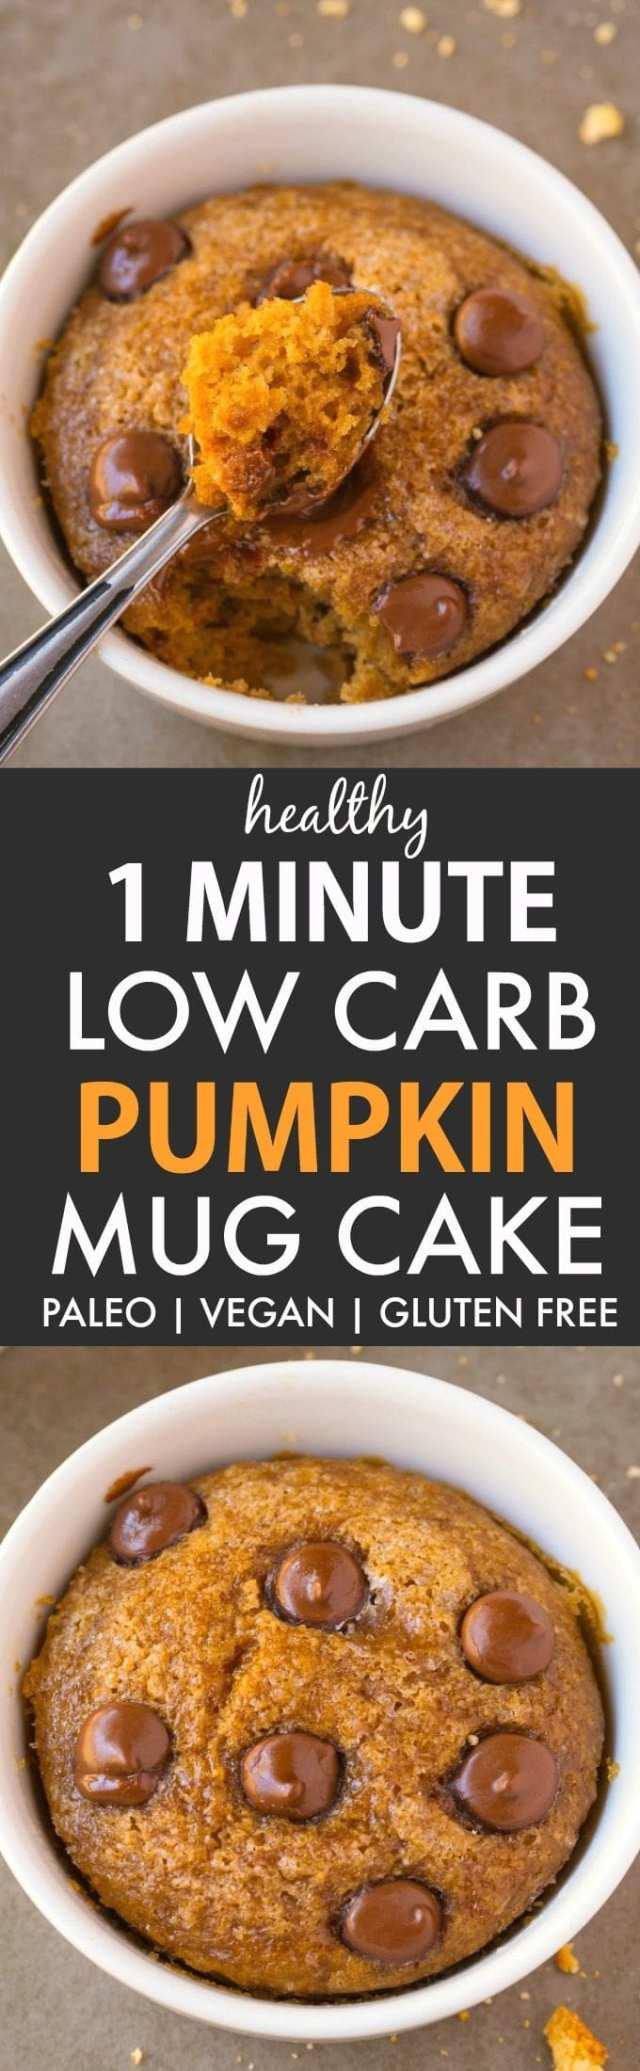 Healthy 1 Minute Low Carb Pumpkin Mug Cake (V, GF, P, DF)- A fool-proof, guilt-free mug cake recipe loaded with pumpkin flavor and super fluffy and light! Oven option included! {vegan, gluten free paleo recipe}- thebigmansworld.com #pumpkin #mugcake